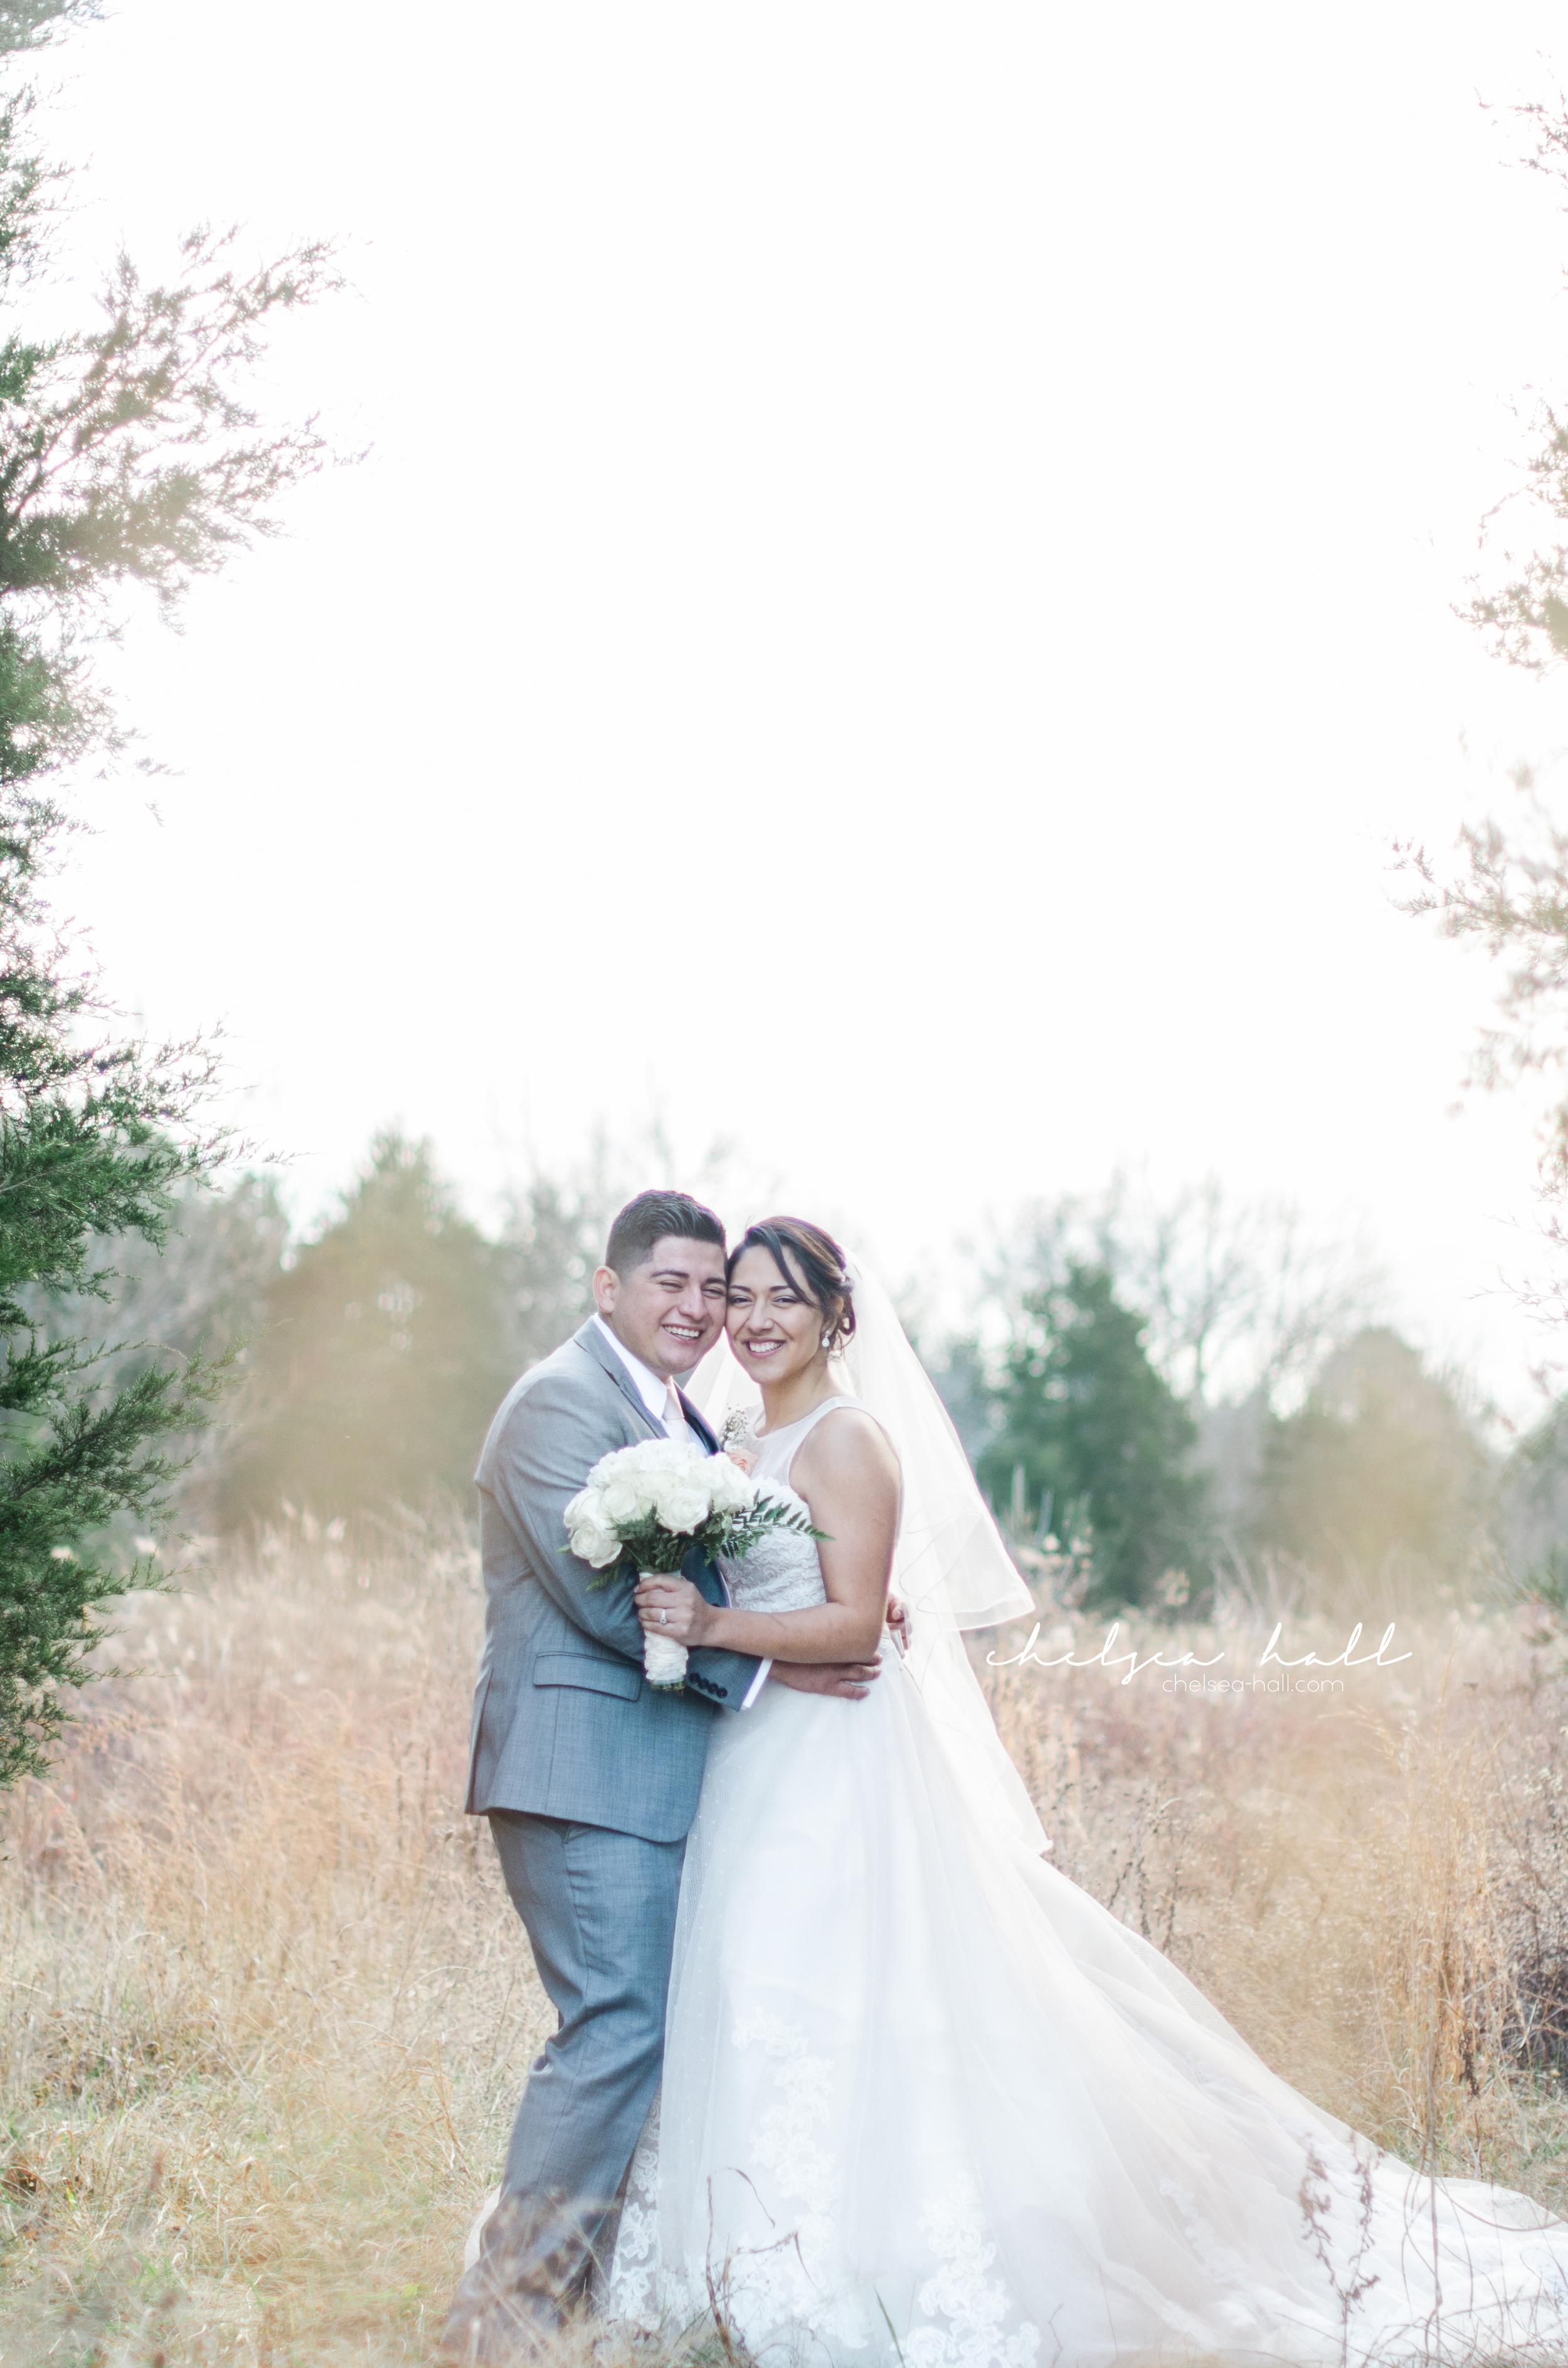 Chelsea Hall Photography | Nashville Wedding Photographer | Wild Turkey Ranch